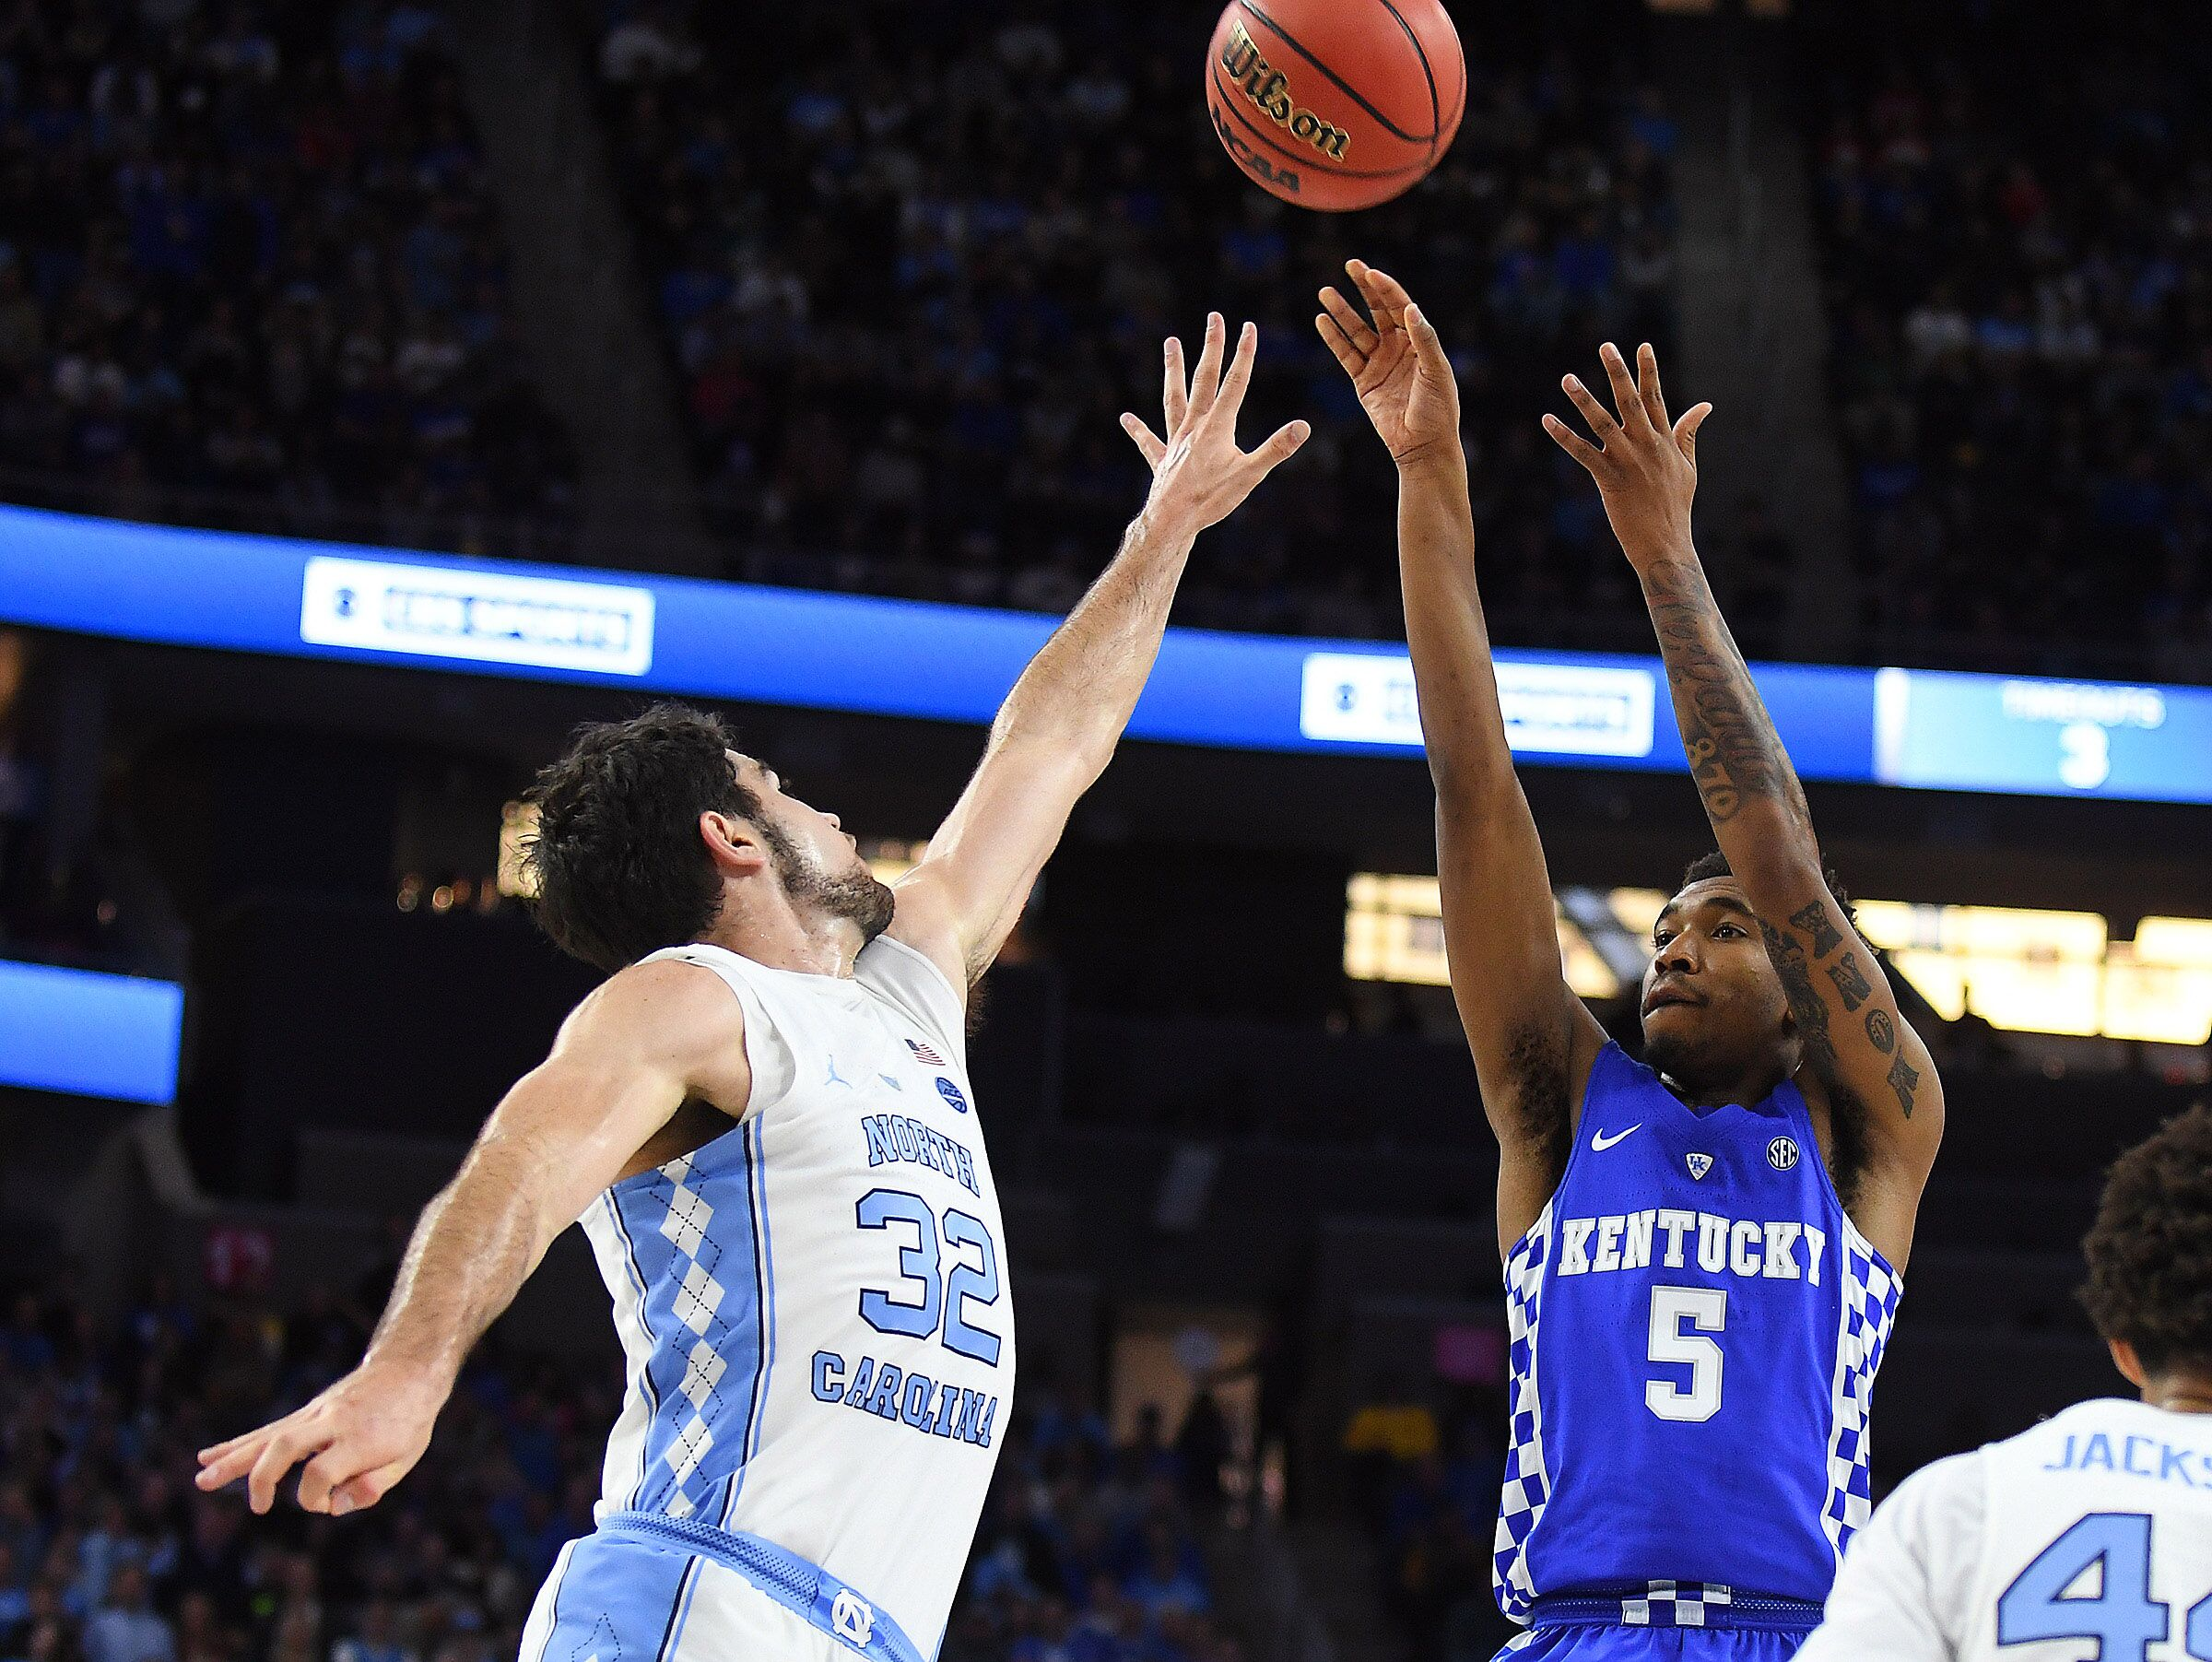 College Basketball Can Anyone Beat The Kentucky Wildcats: Kentucky Basketball: Strong North Carolina Scoring Calls